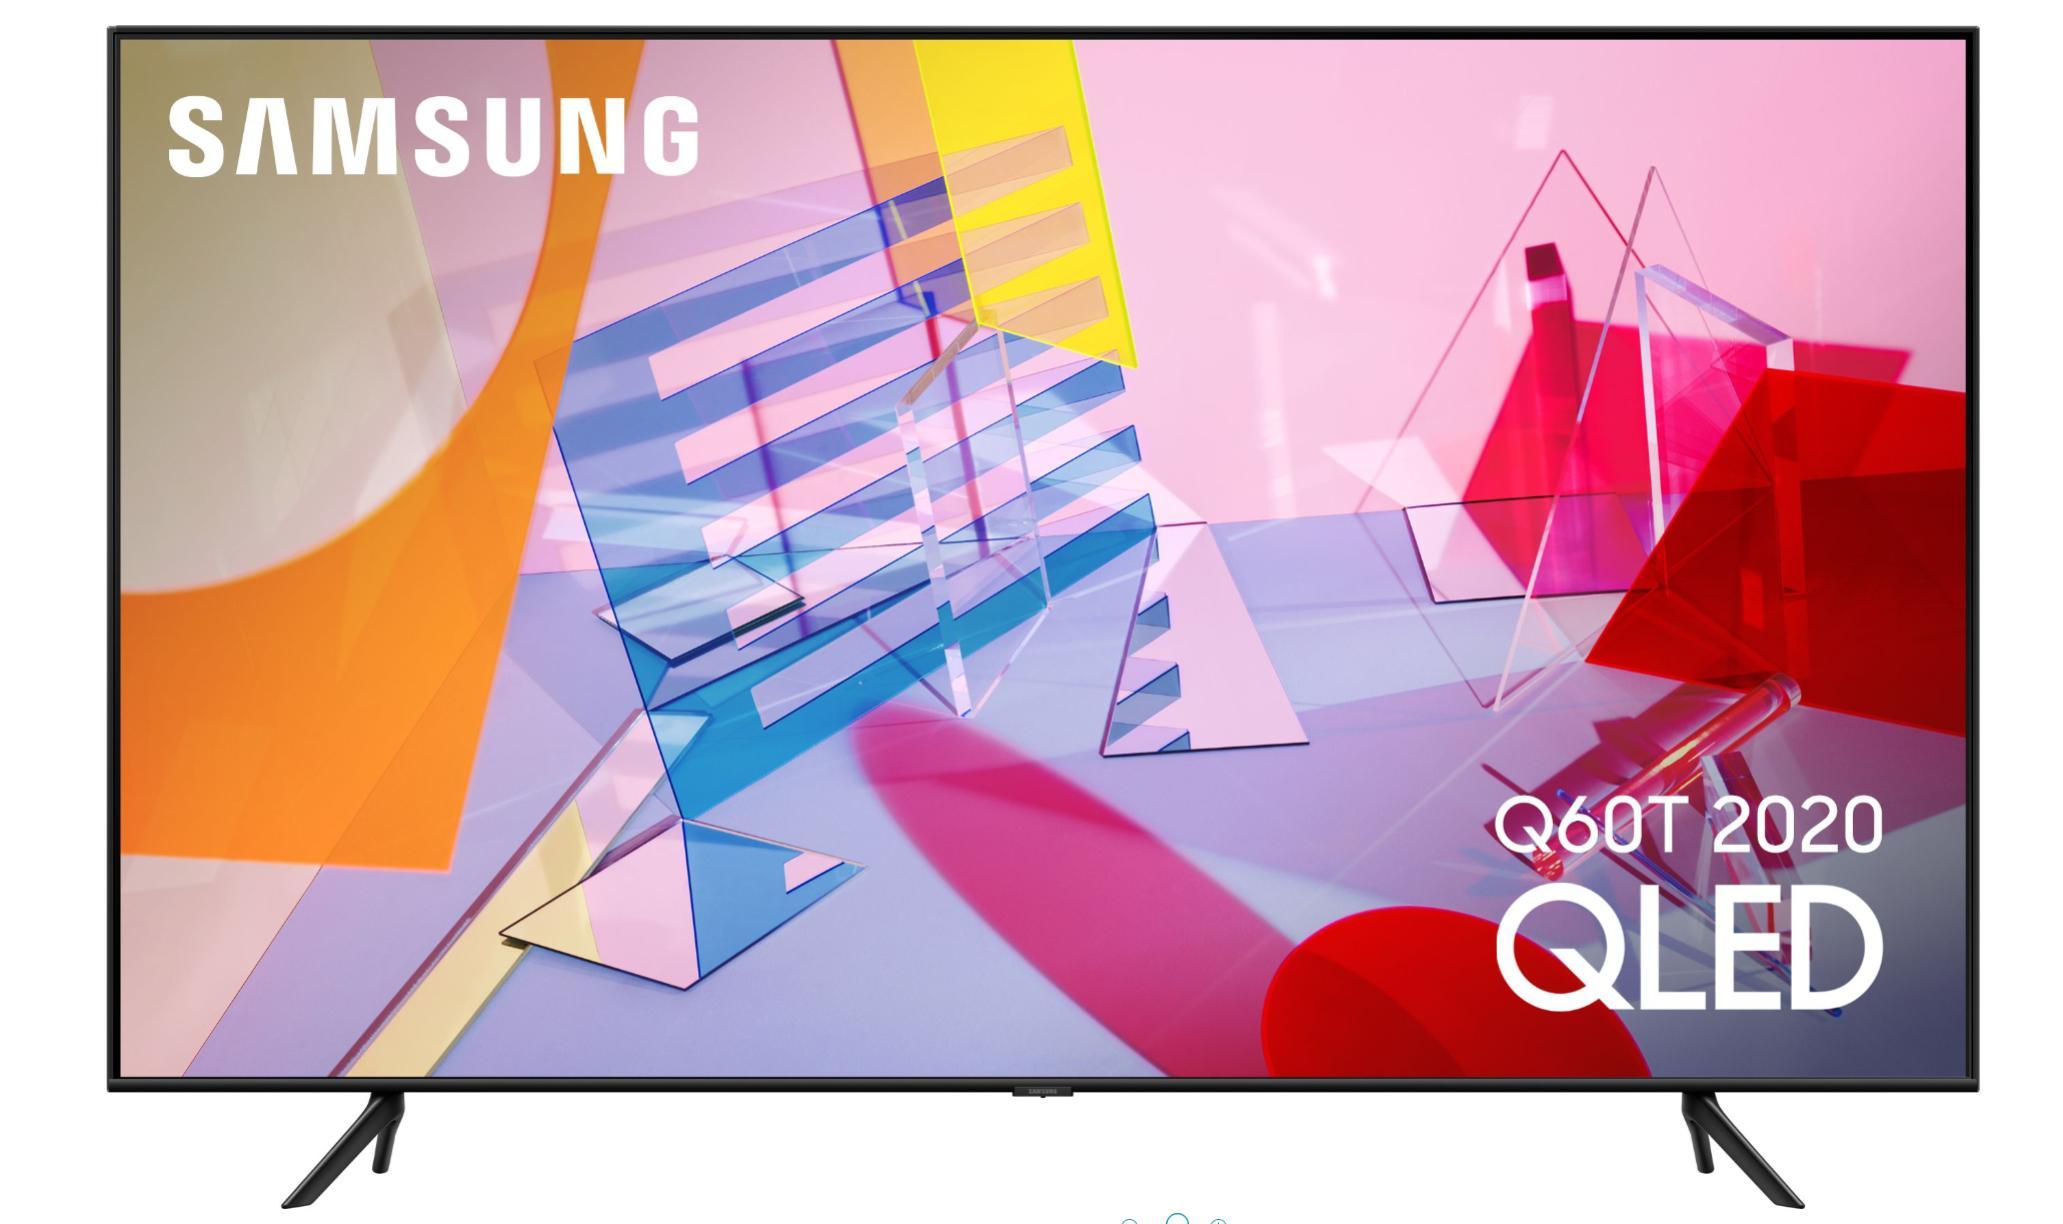 "TV 65"" Samsung QE65Q60T (2020) - QLED, 100 Hz, 4K UHD, HDR 10+, 3100 PQI, Smart TV"